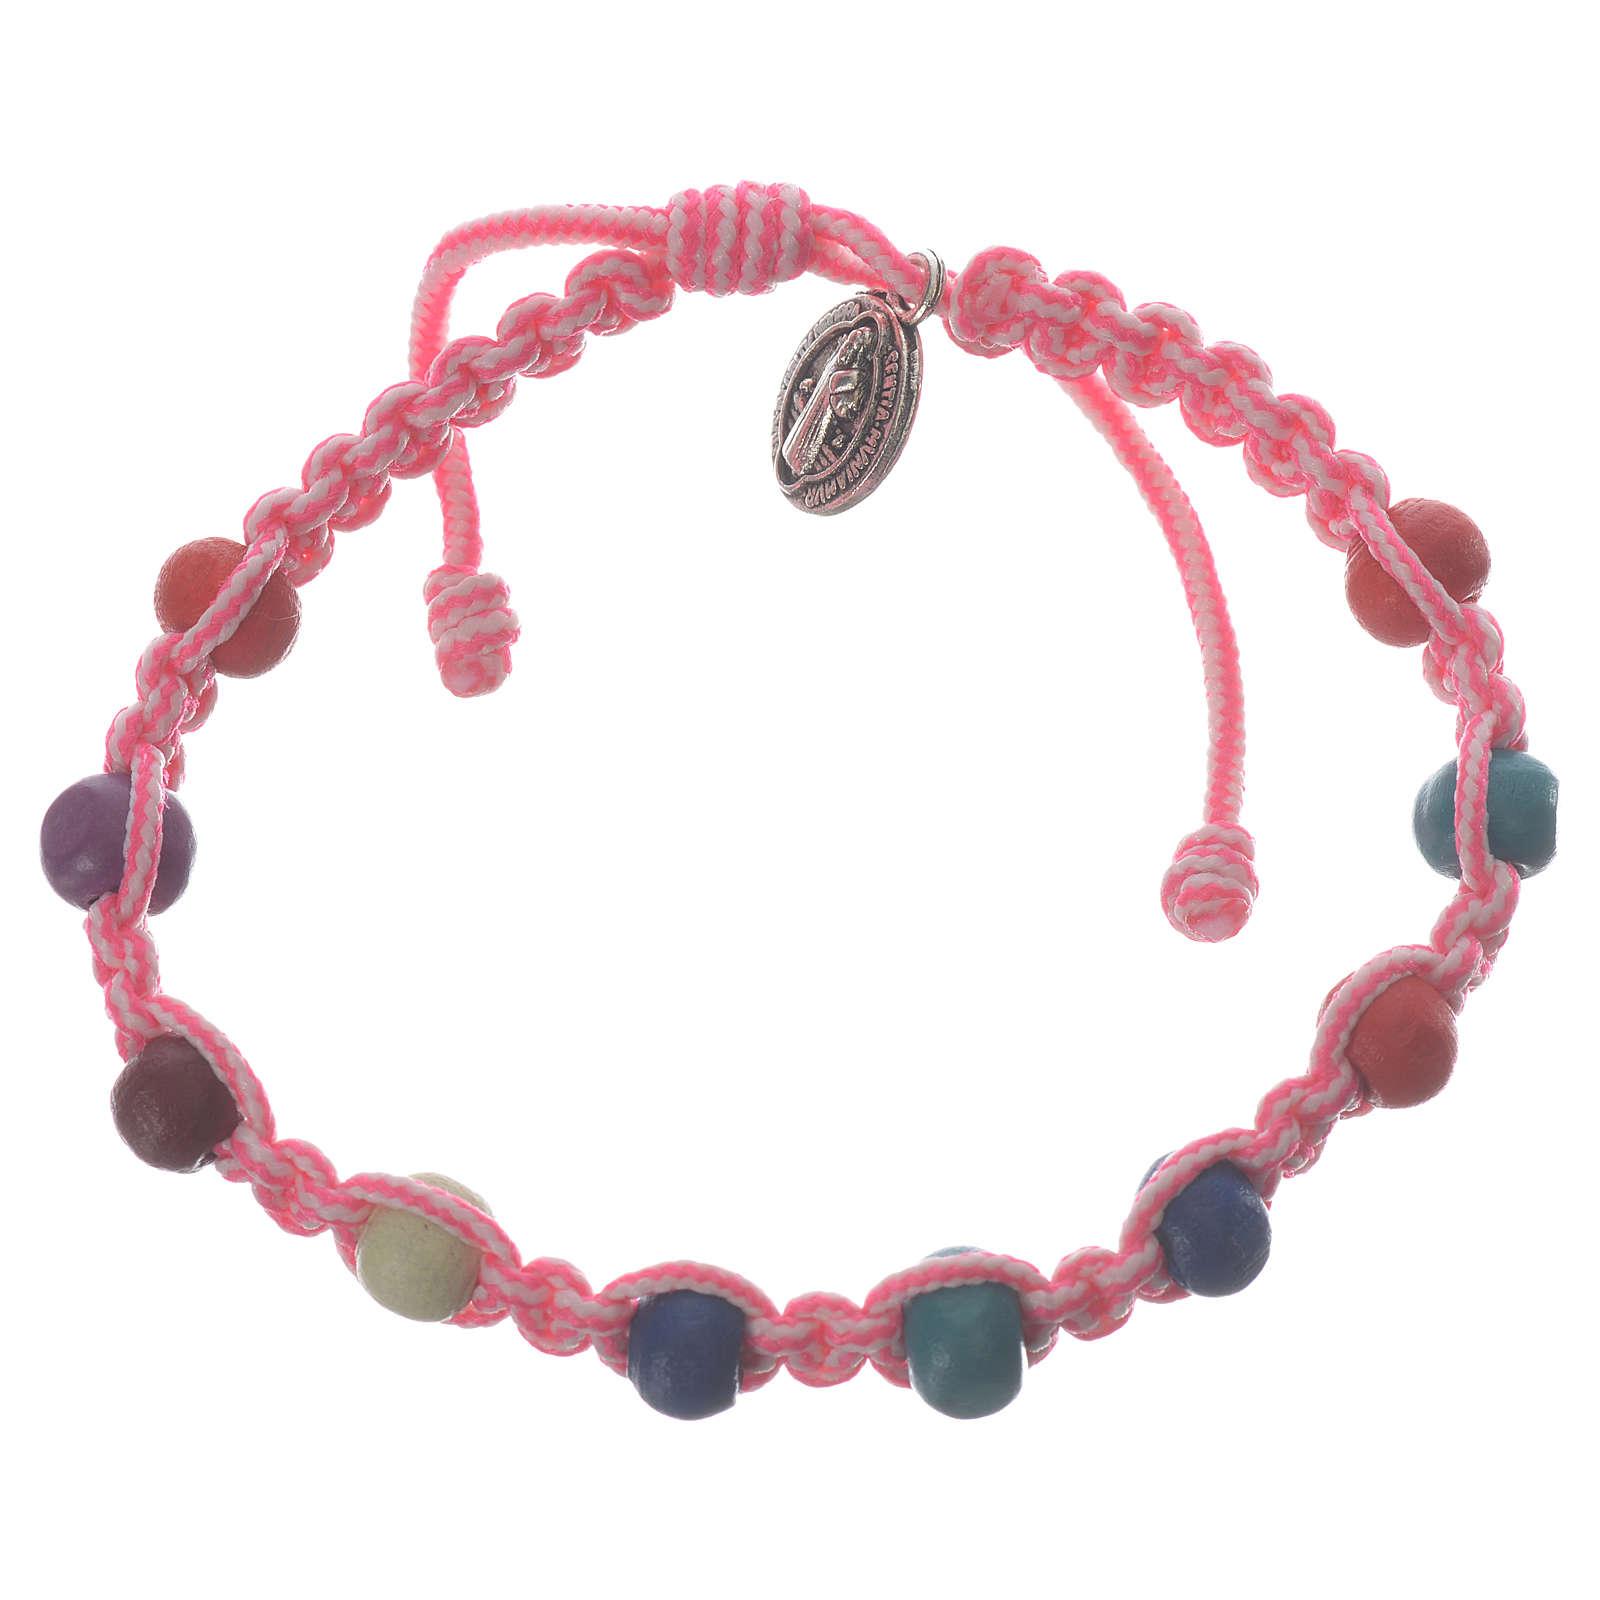 Pulsera decena niño Medjugorje hilo rosa-blanco 4